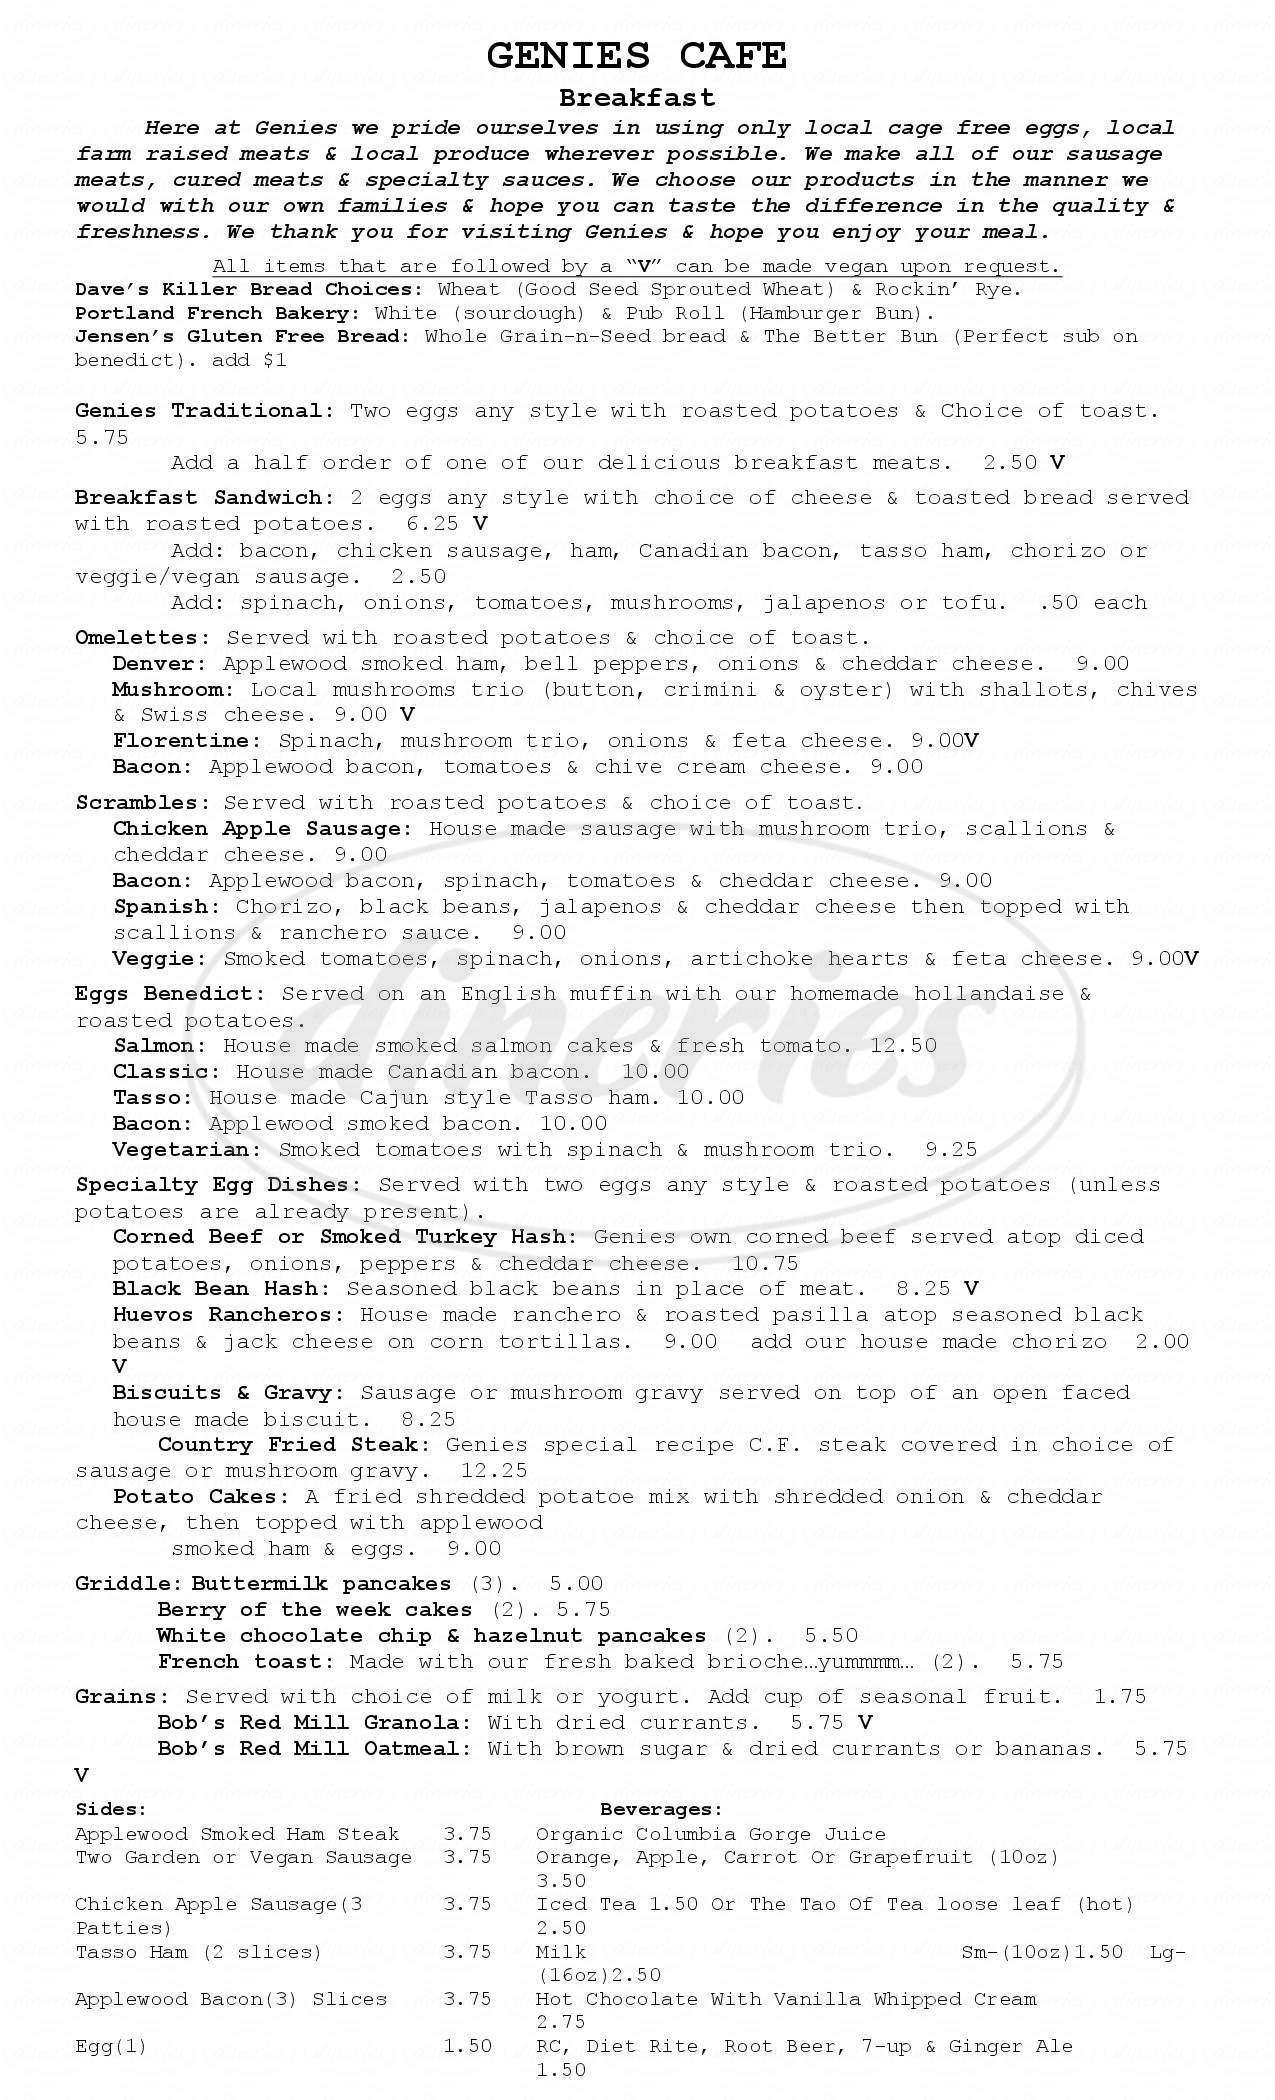 menu for Genies Cafe